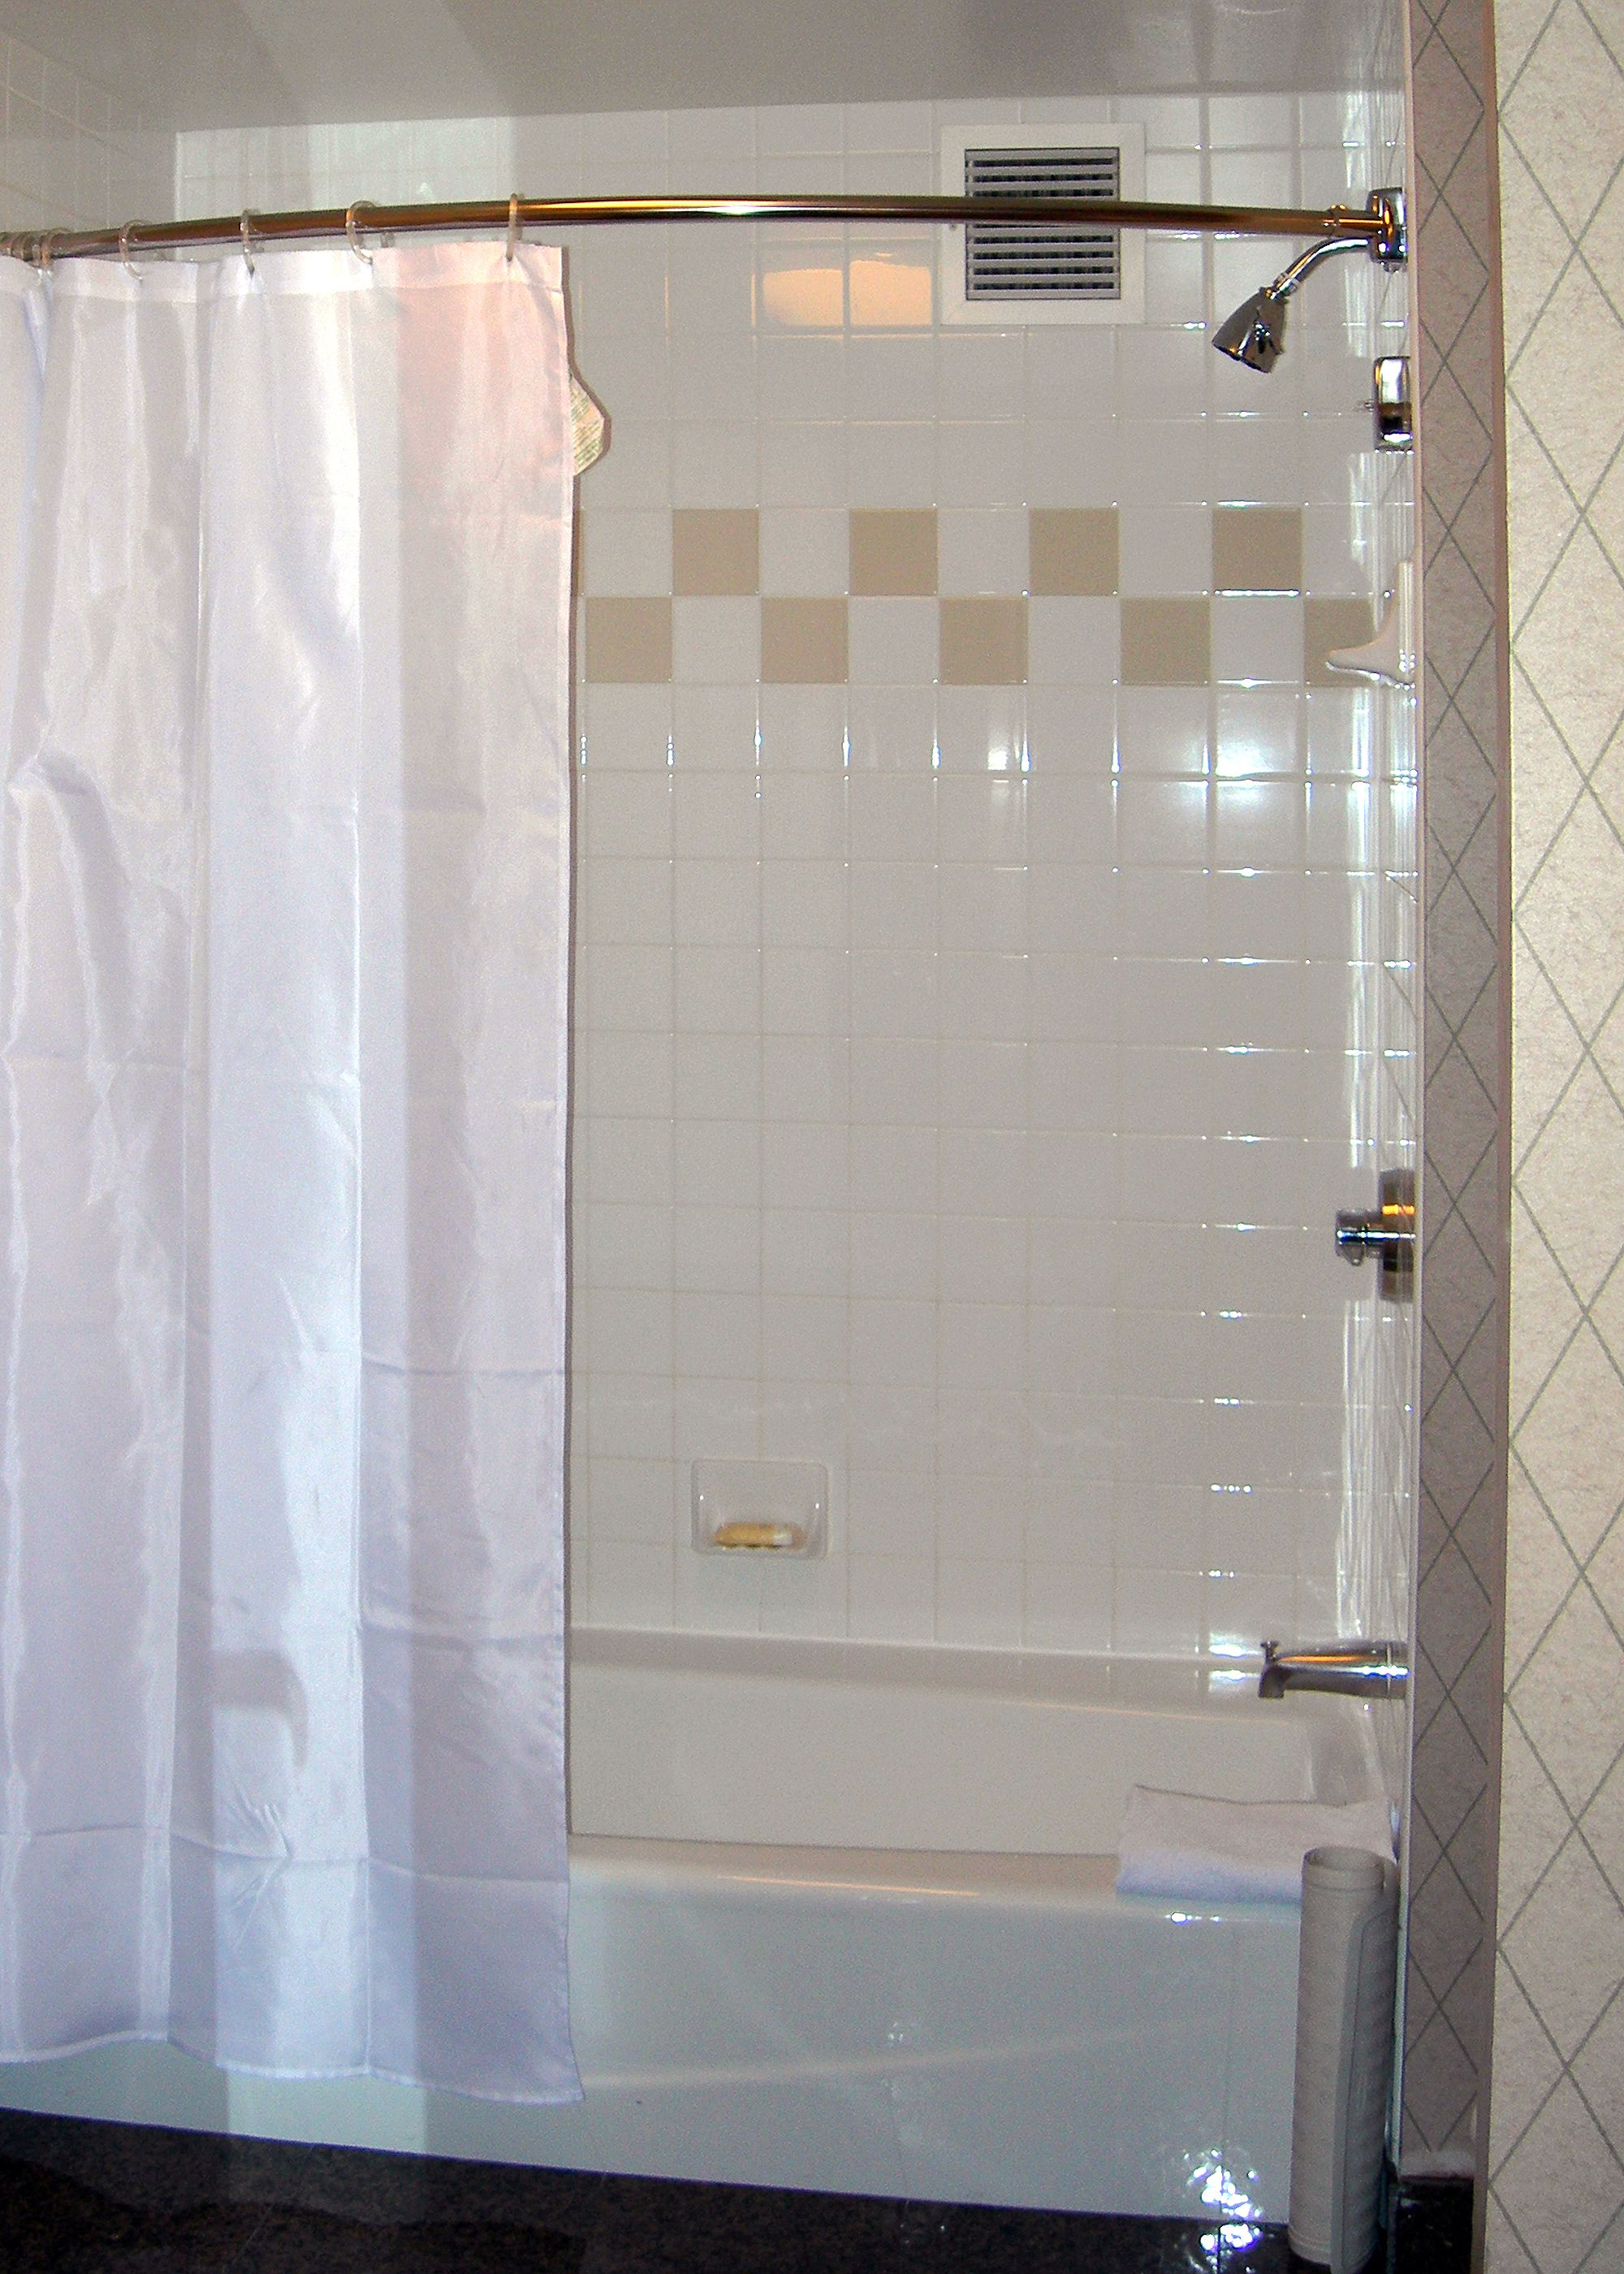 Moen Shower Cartridge Replacement 1225 Cartridge Cool Shower